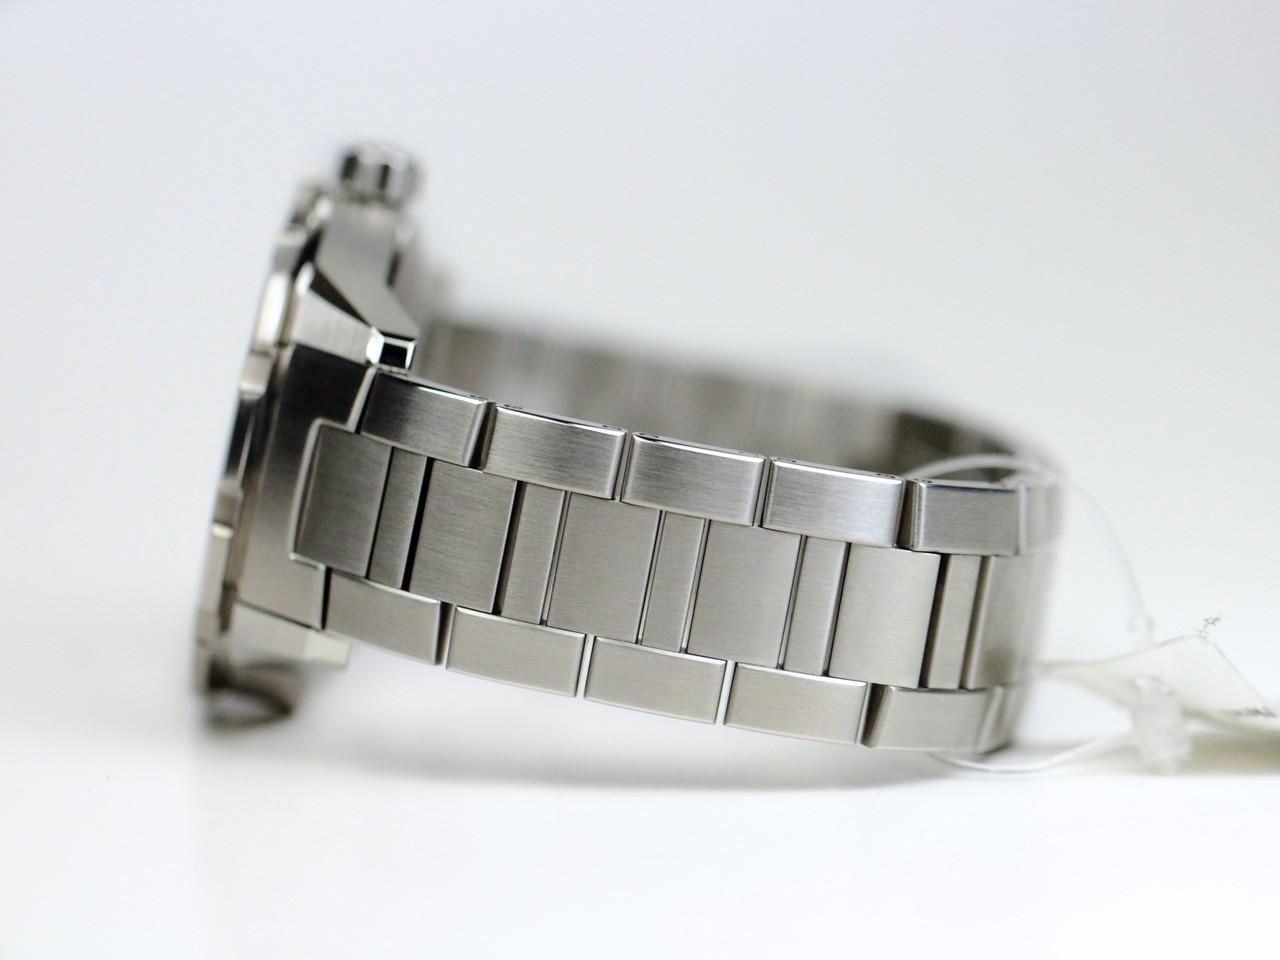 Steel Bracelet - IWC Watch - Aquatimer 2000 Automatic IW356809 - www.Legendoftime.com - Chicago Watch Center